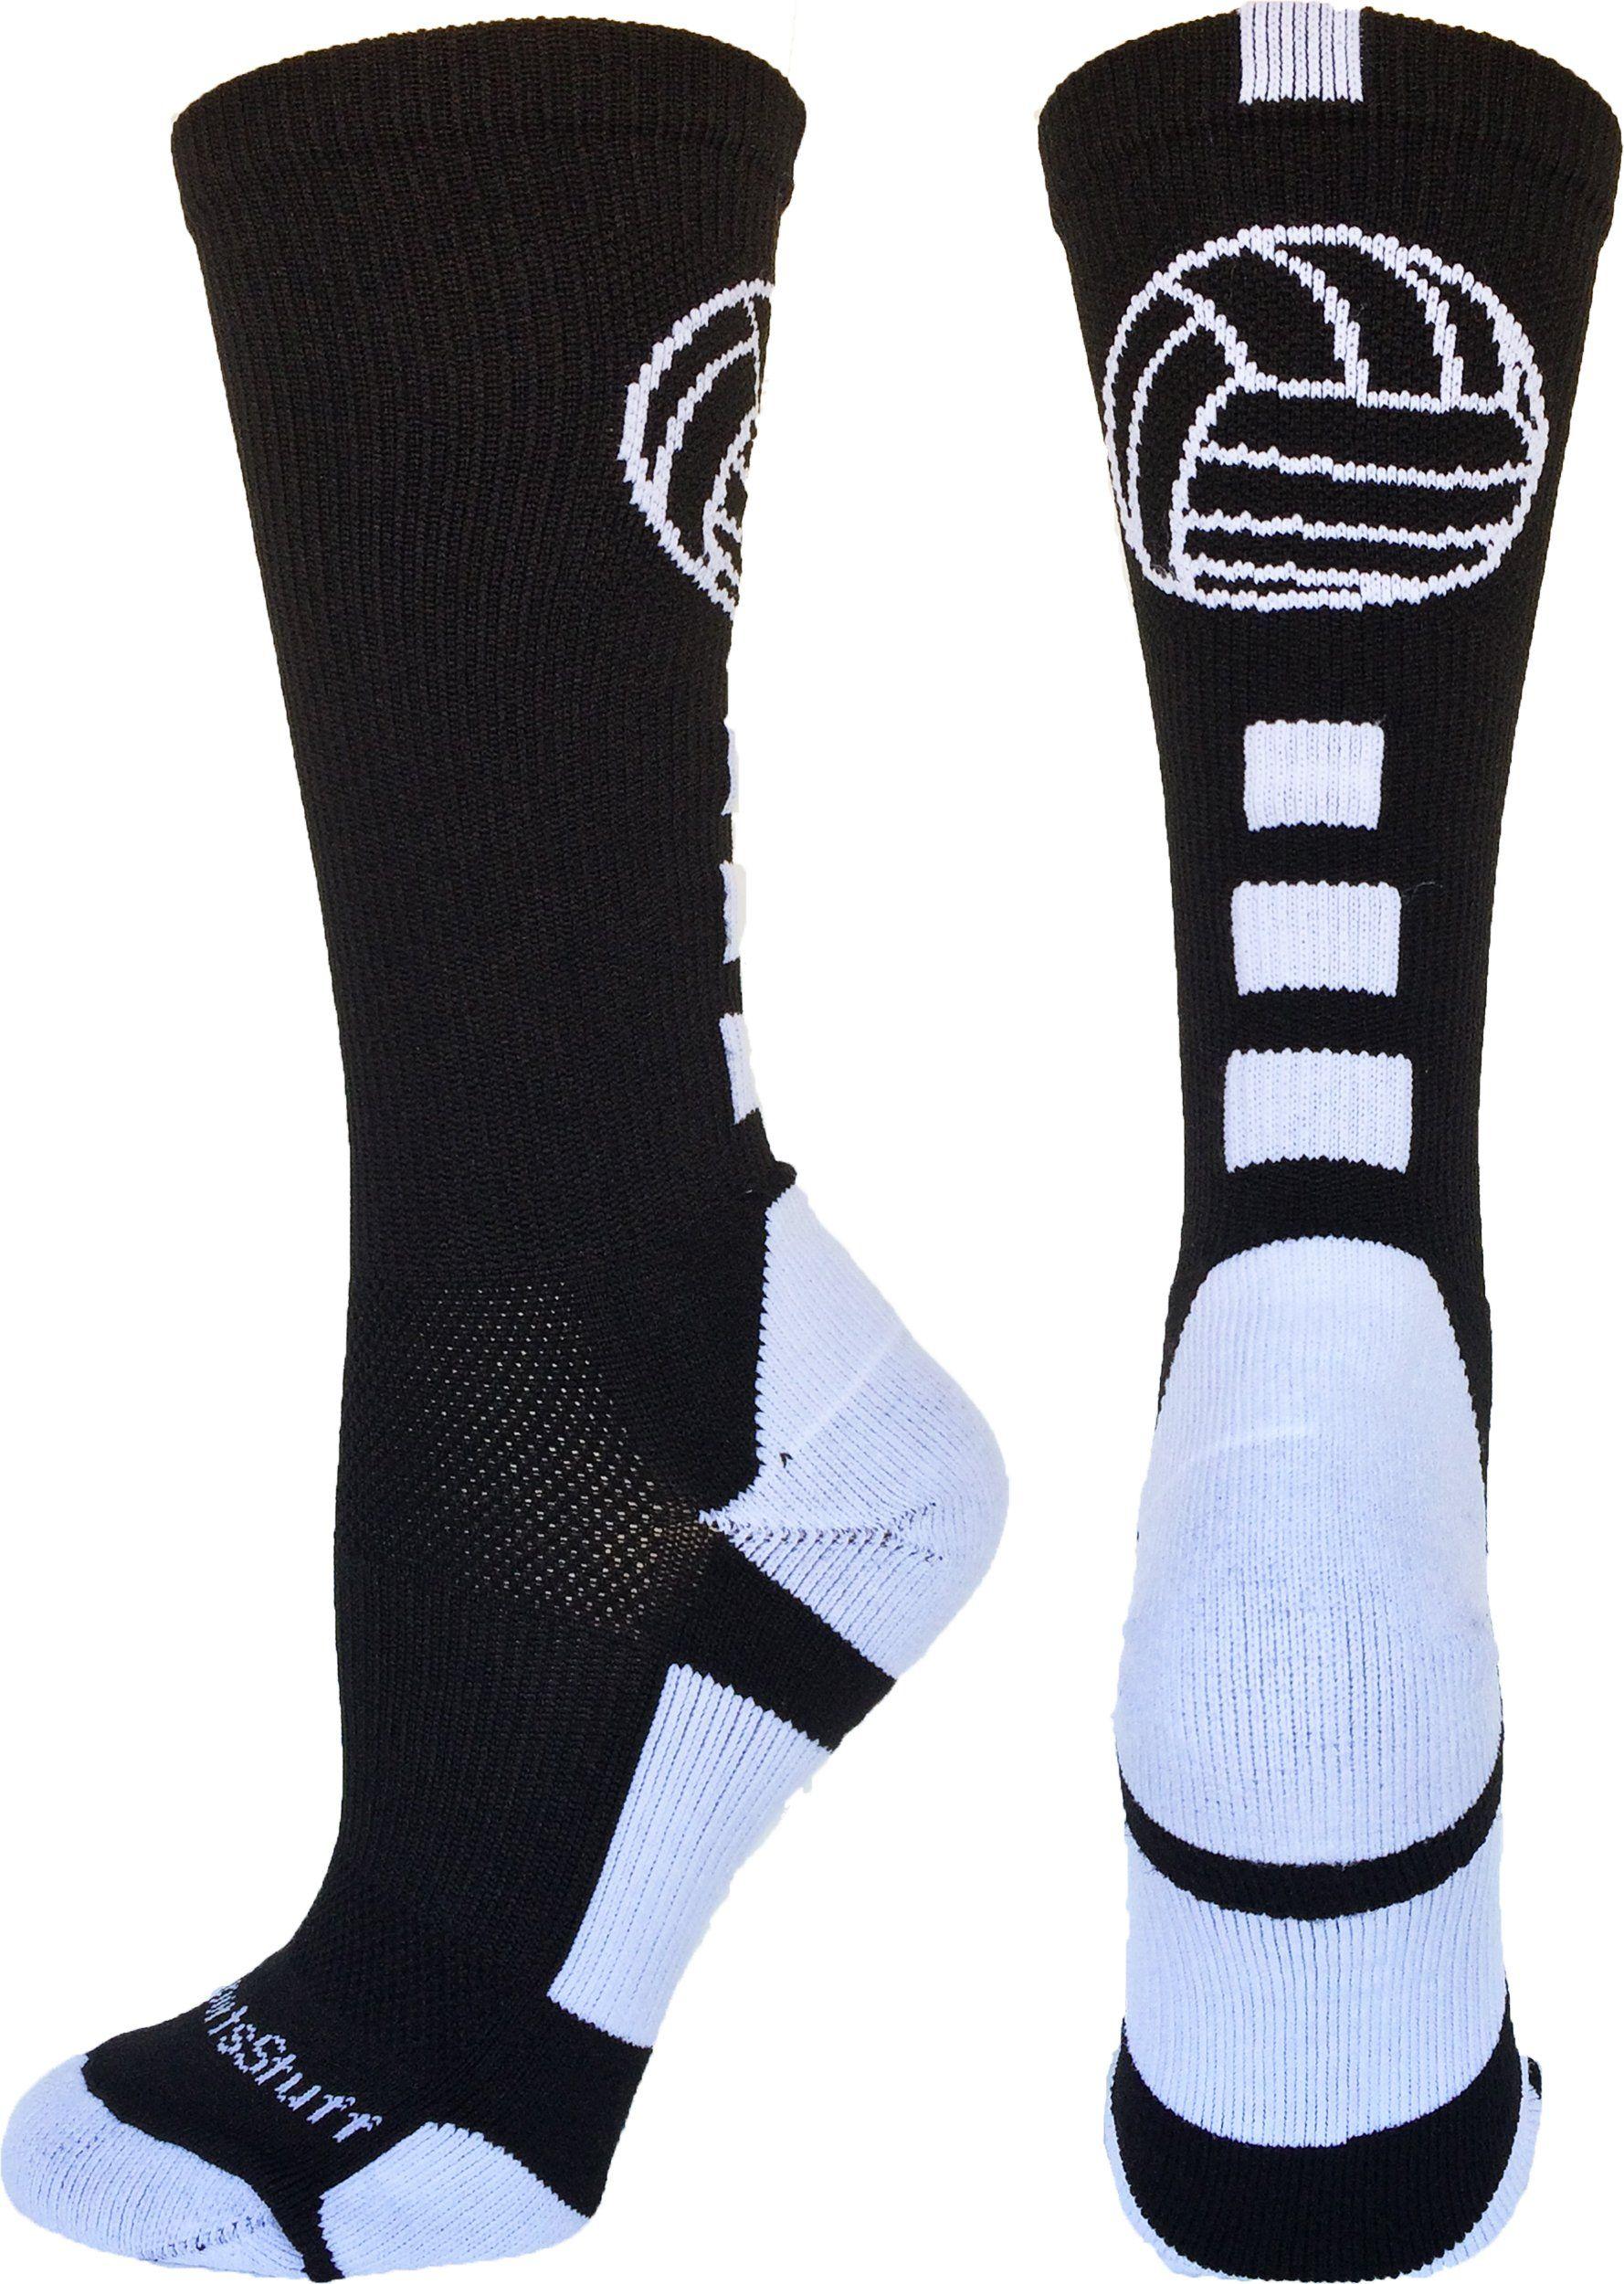 Volleyball Logo Crew Socks Multiple Colors Volleyball Socks Volleyball Outfits Basketball Shorts Girls